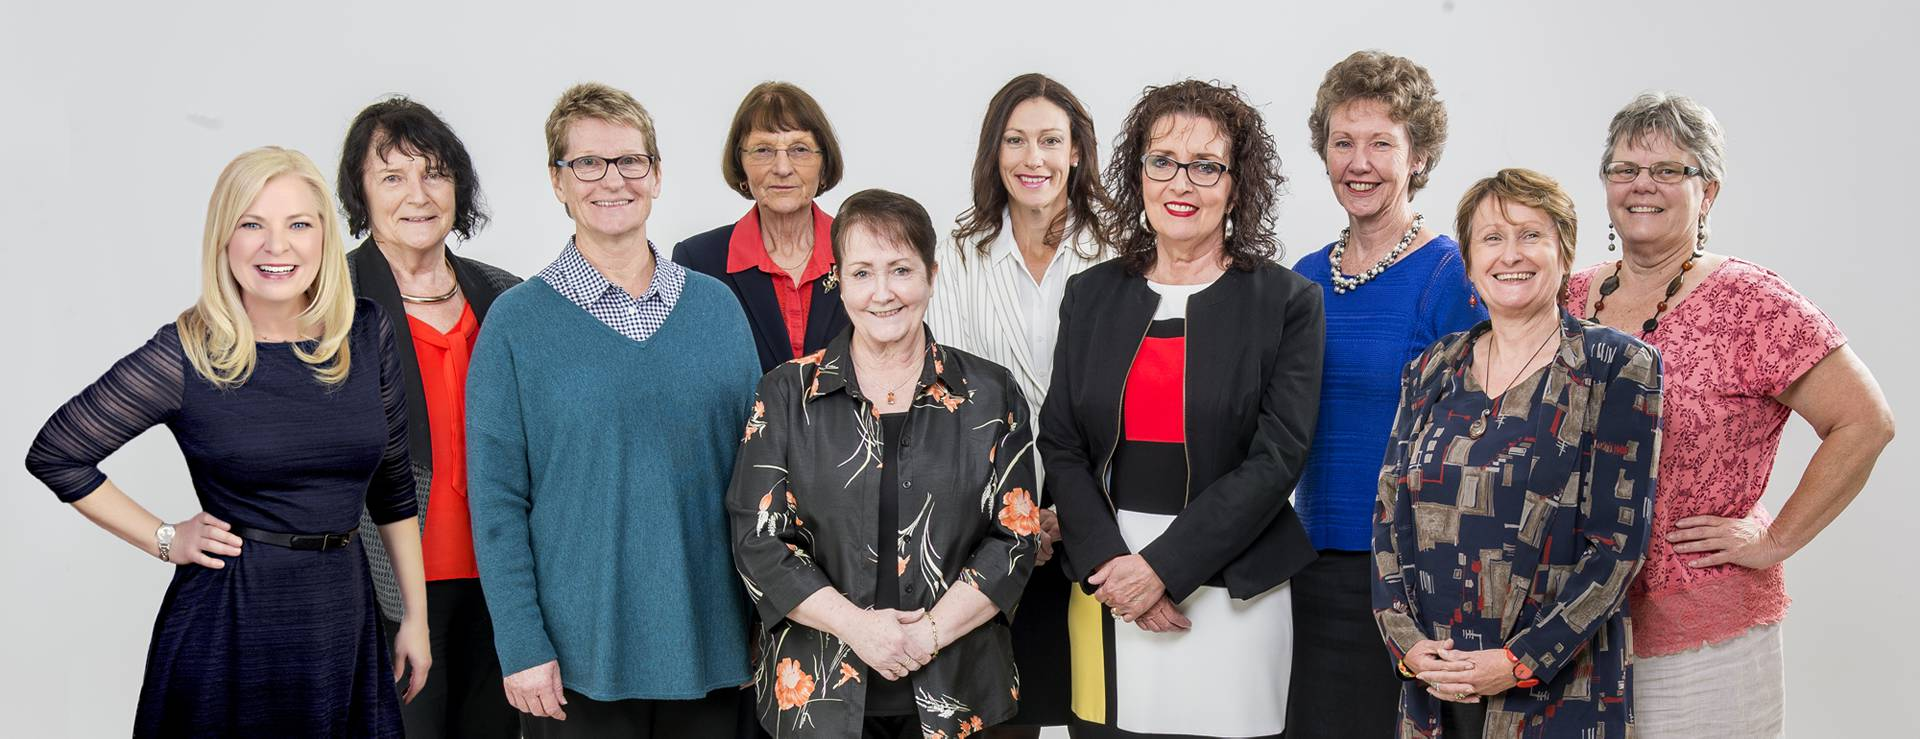 Leadership Research International Group